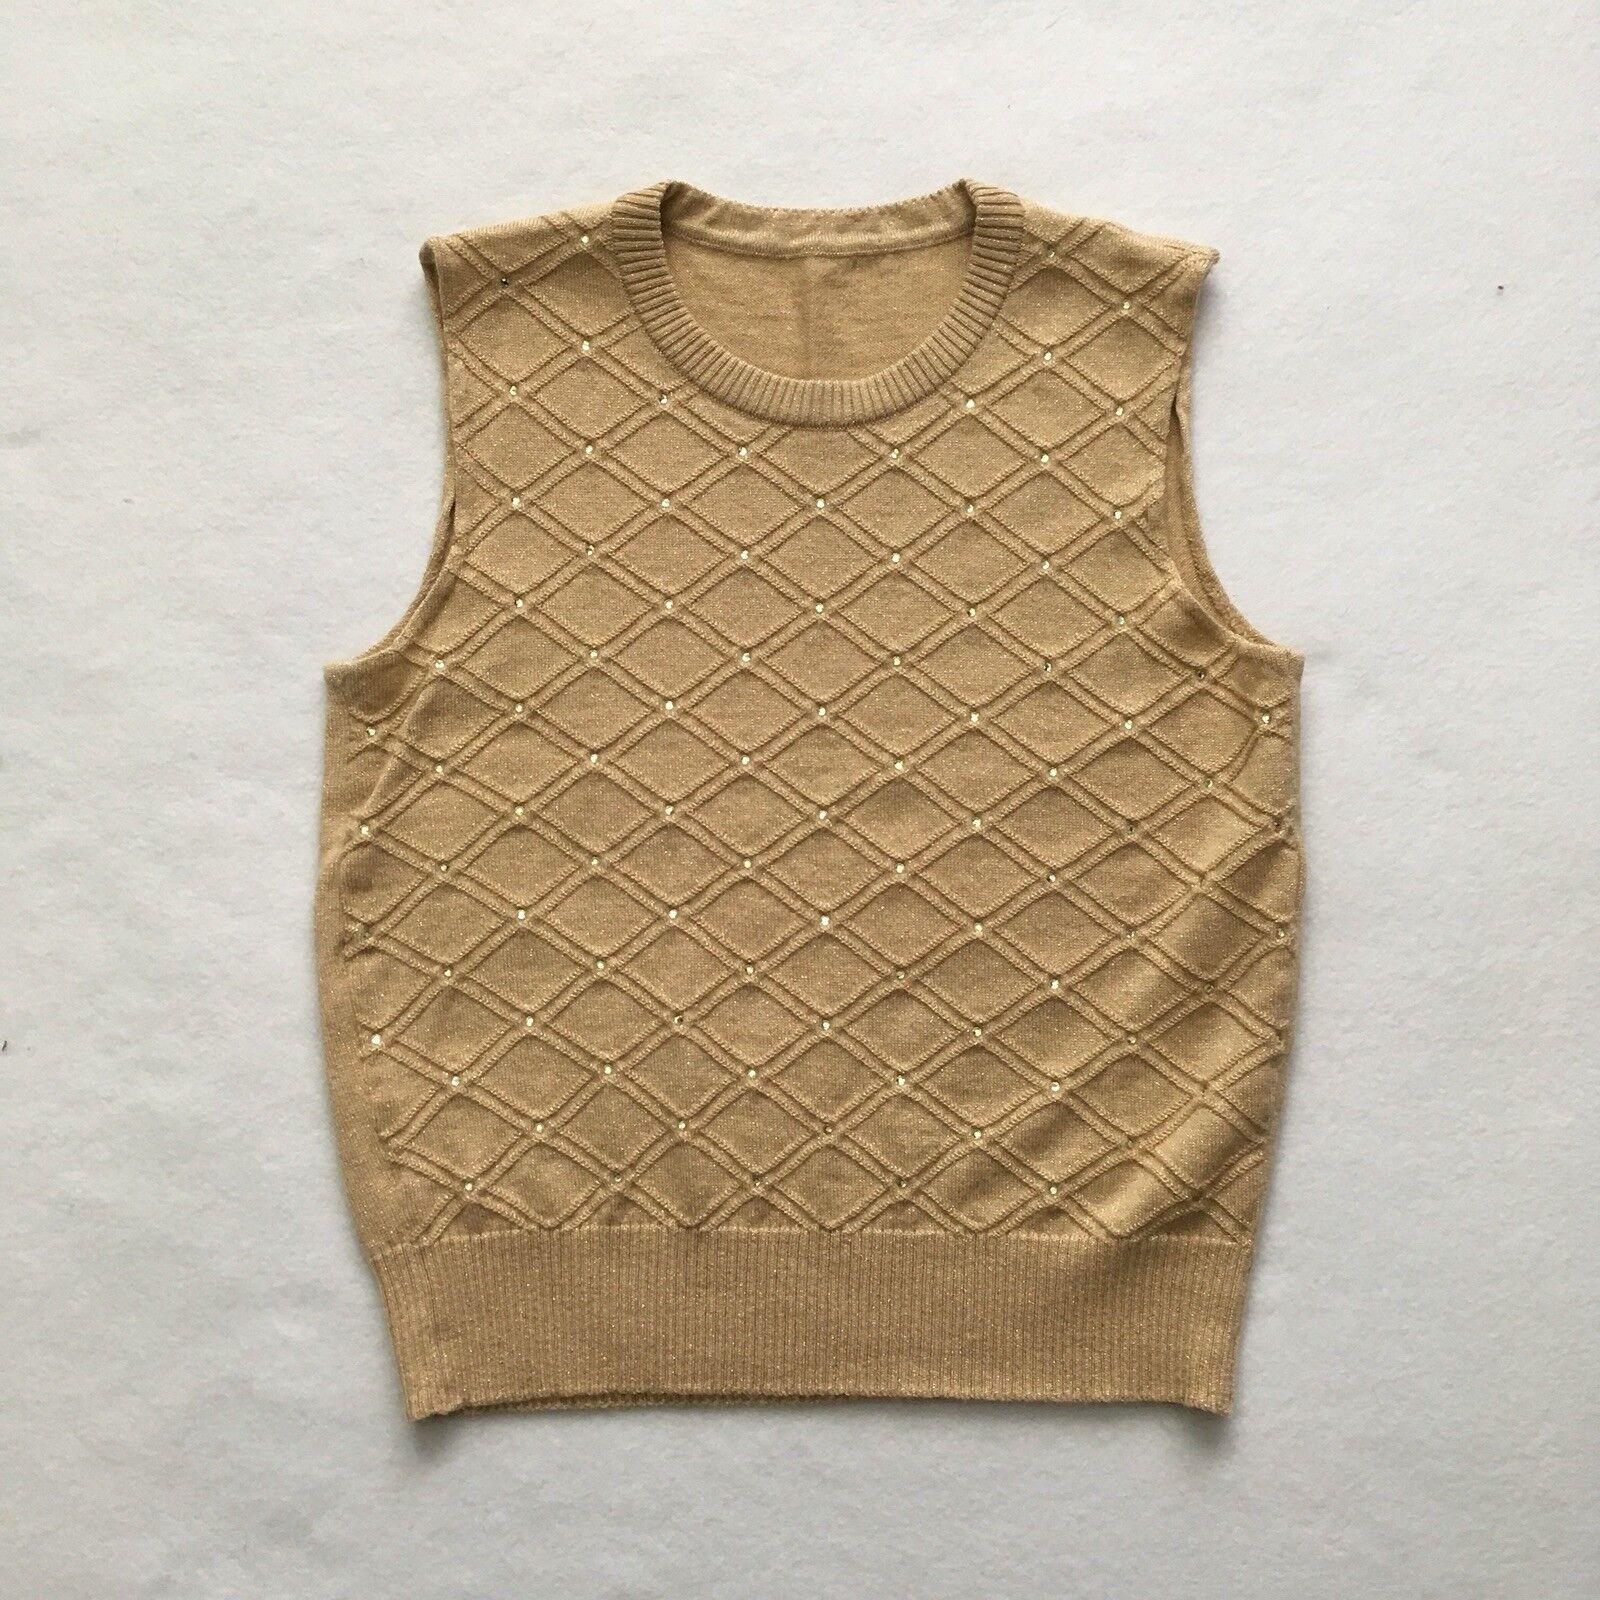 Escada gold Metallic Lattice Embellished Embellished Embellished Wool Blend Sweater Cardigan Set 36 6 ea0852